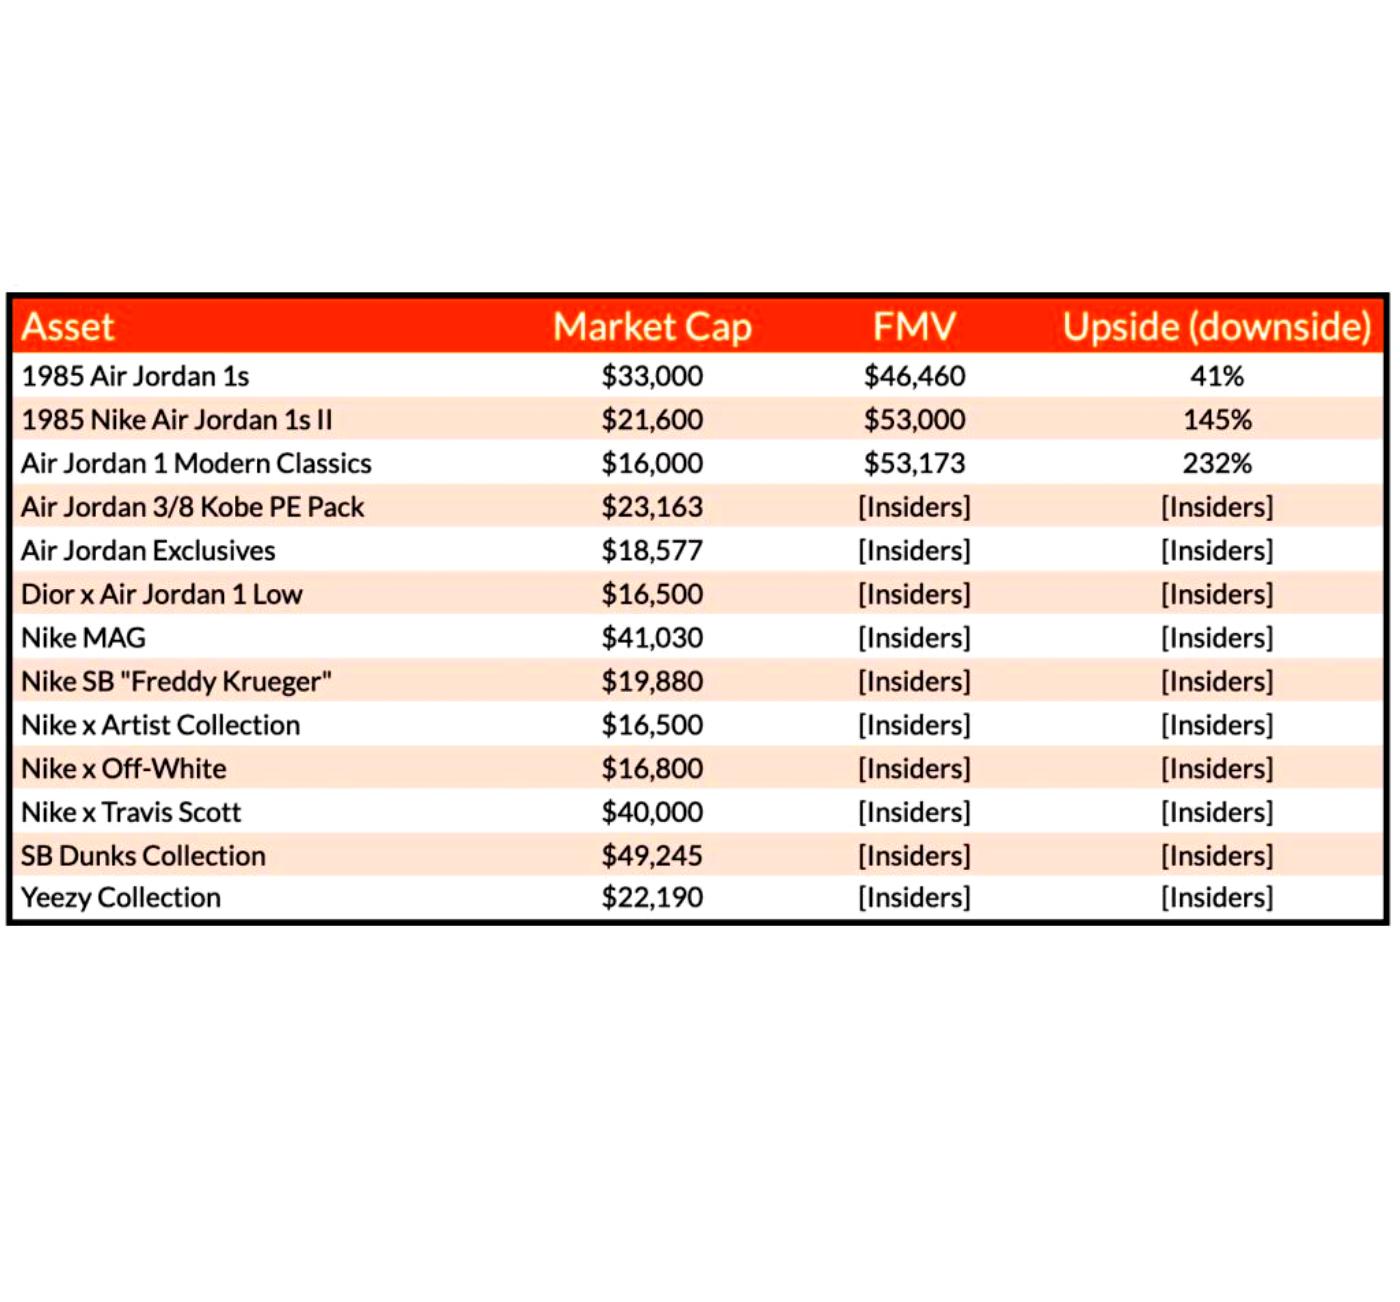 Asset, Market Cap, FMV, Upside(downside)